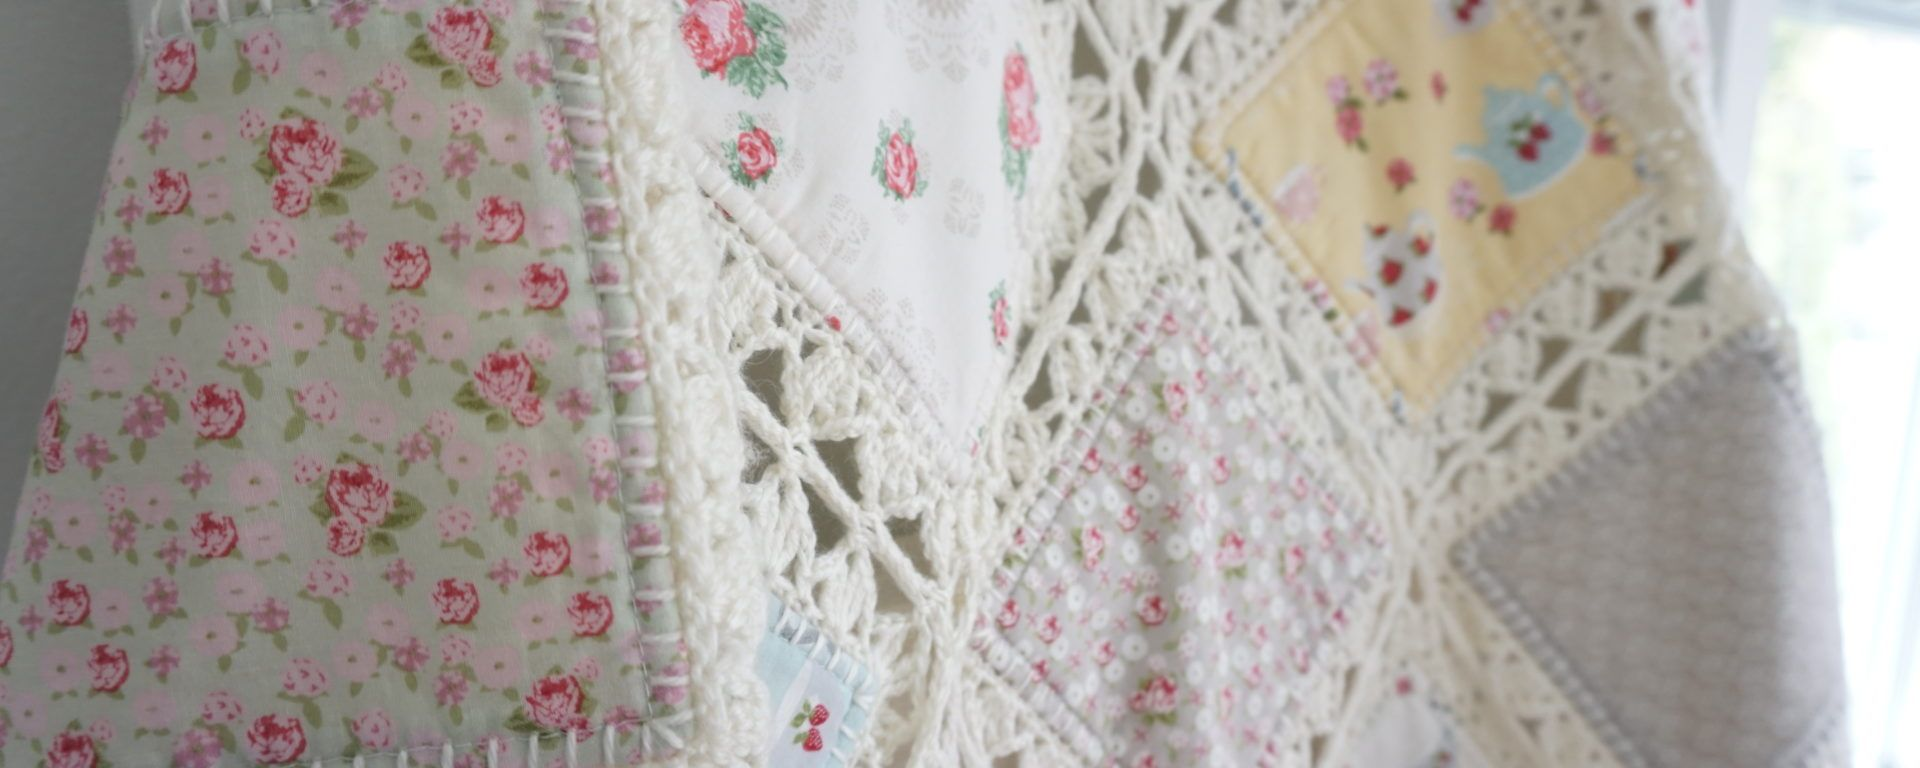 Pin de Julie Levangie en crochet | Pinterest | Ganchillo y Tutoriales